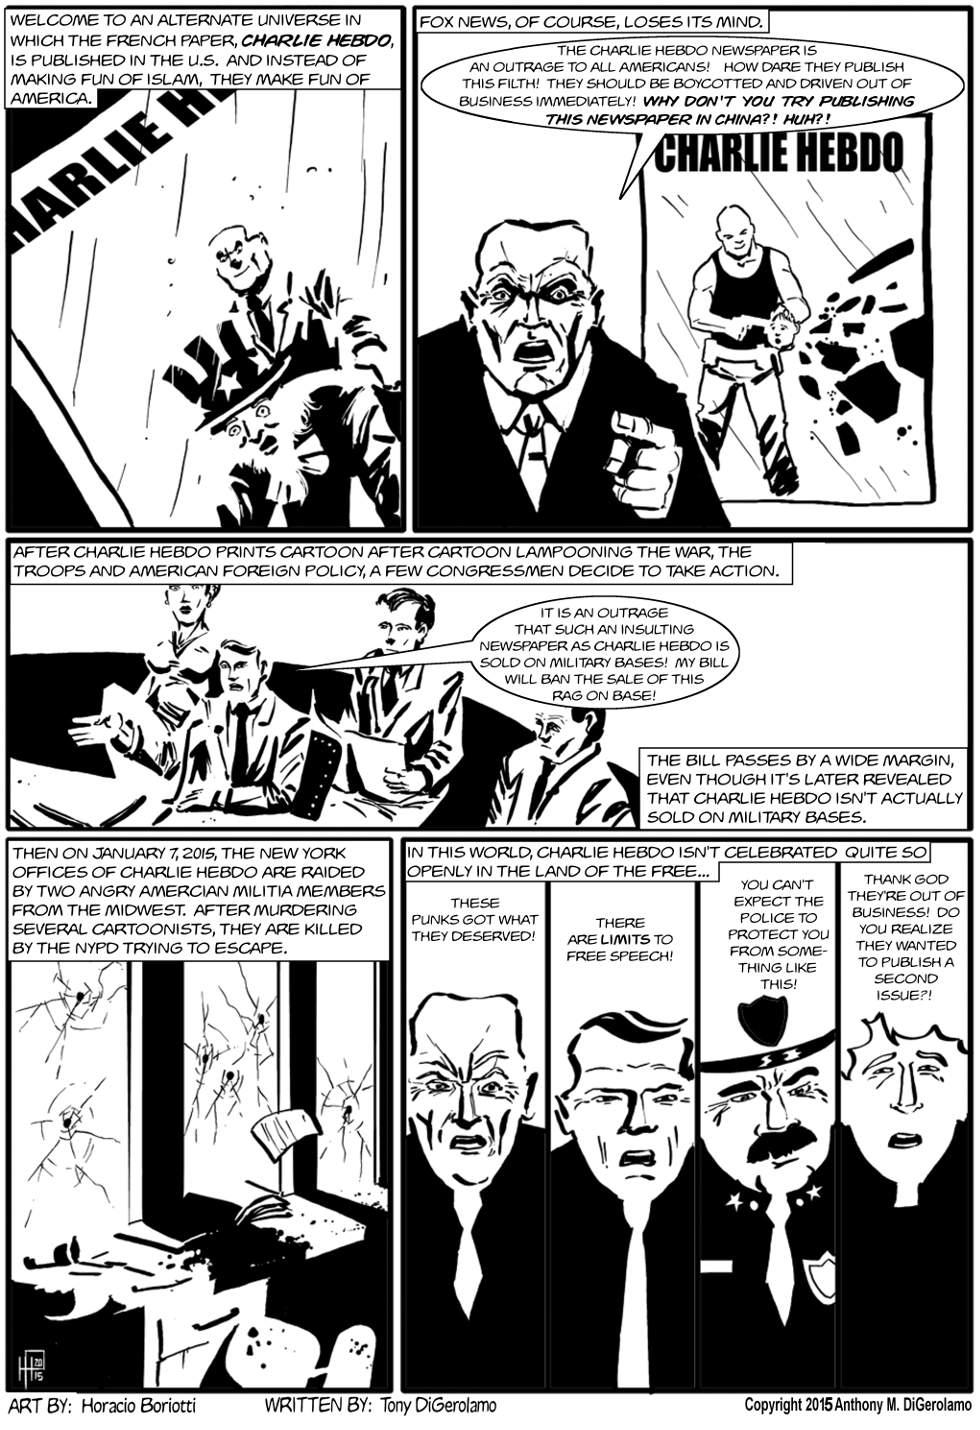 The Antiwar Comic:  Alternate Universe Charlie Hebdo